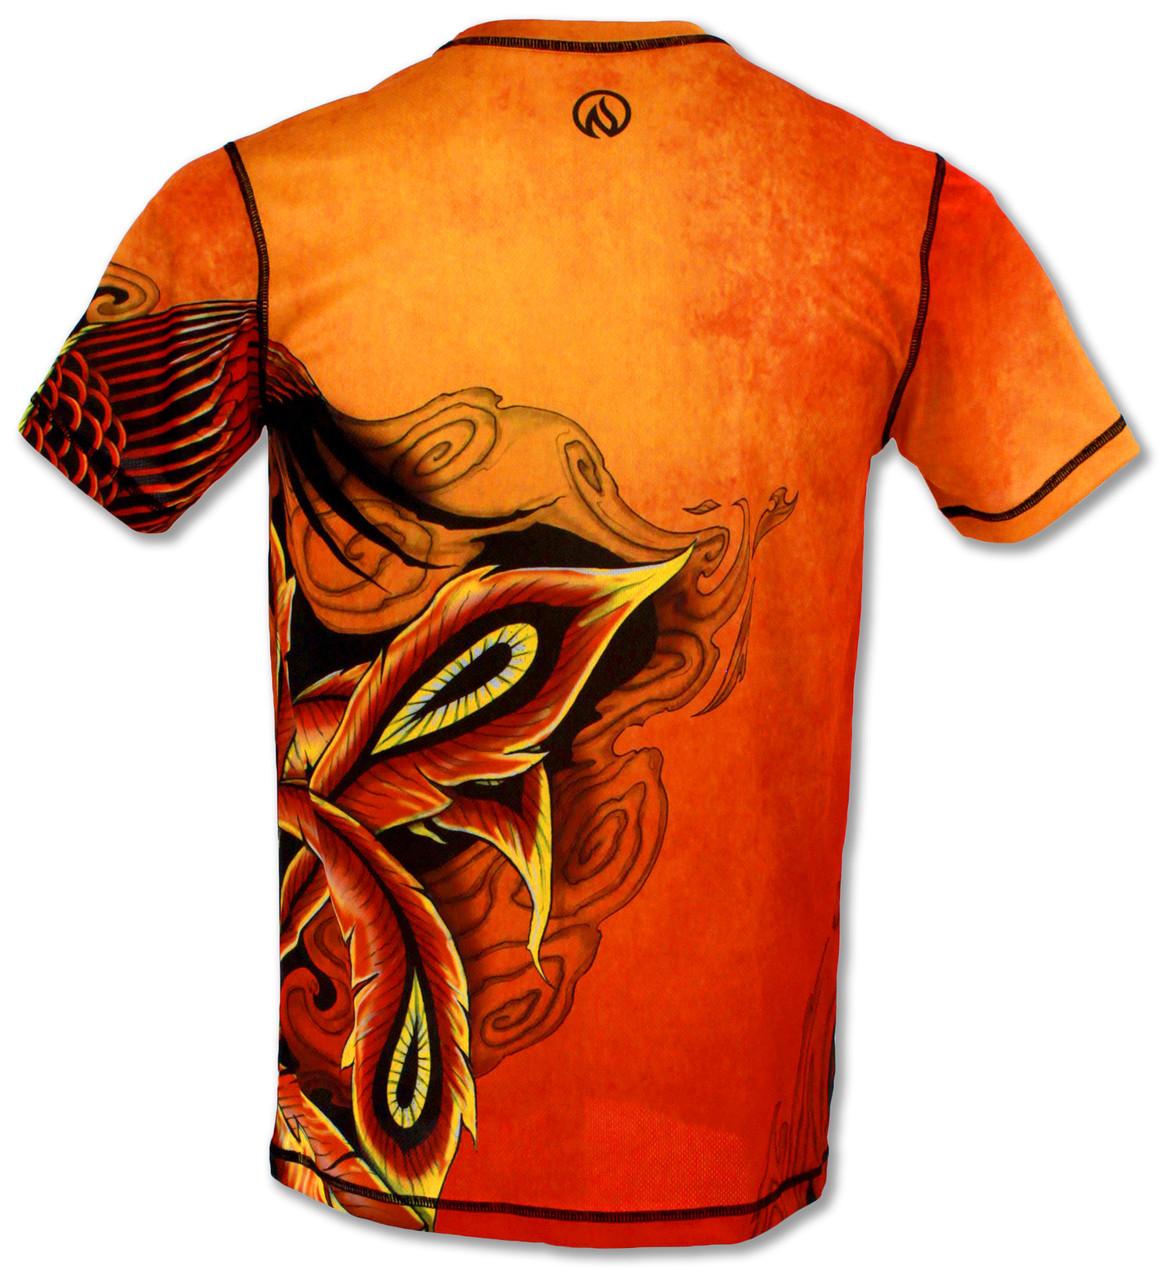 INKnBURN Men's Phoenix Tech Shirt Back